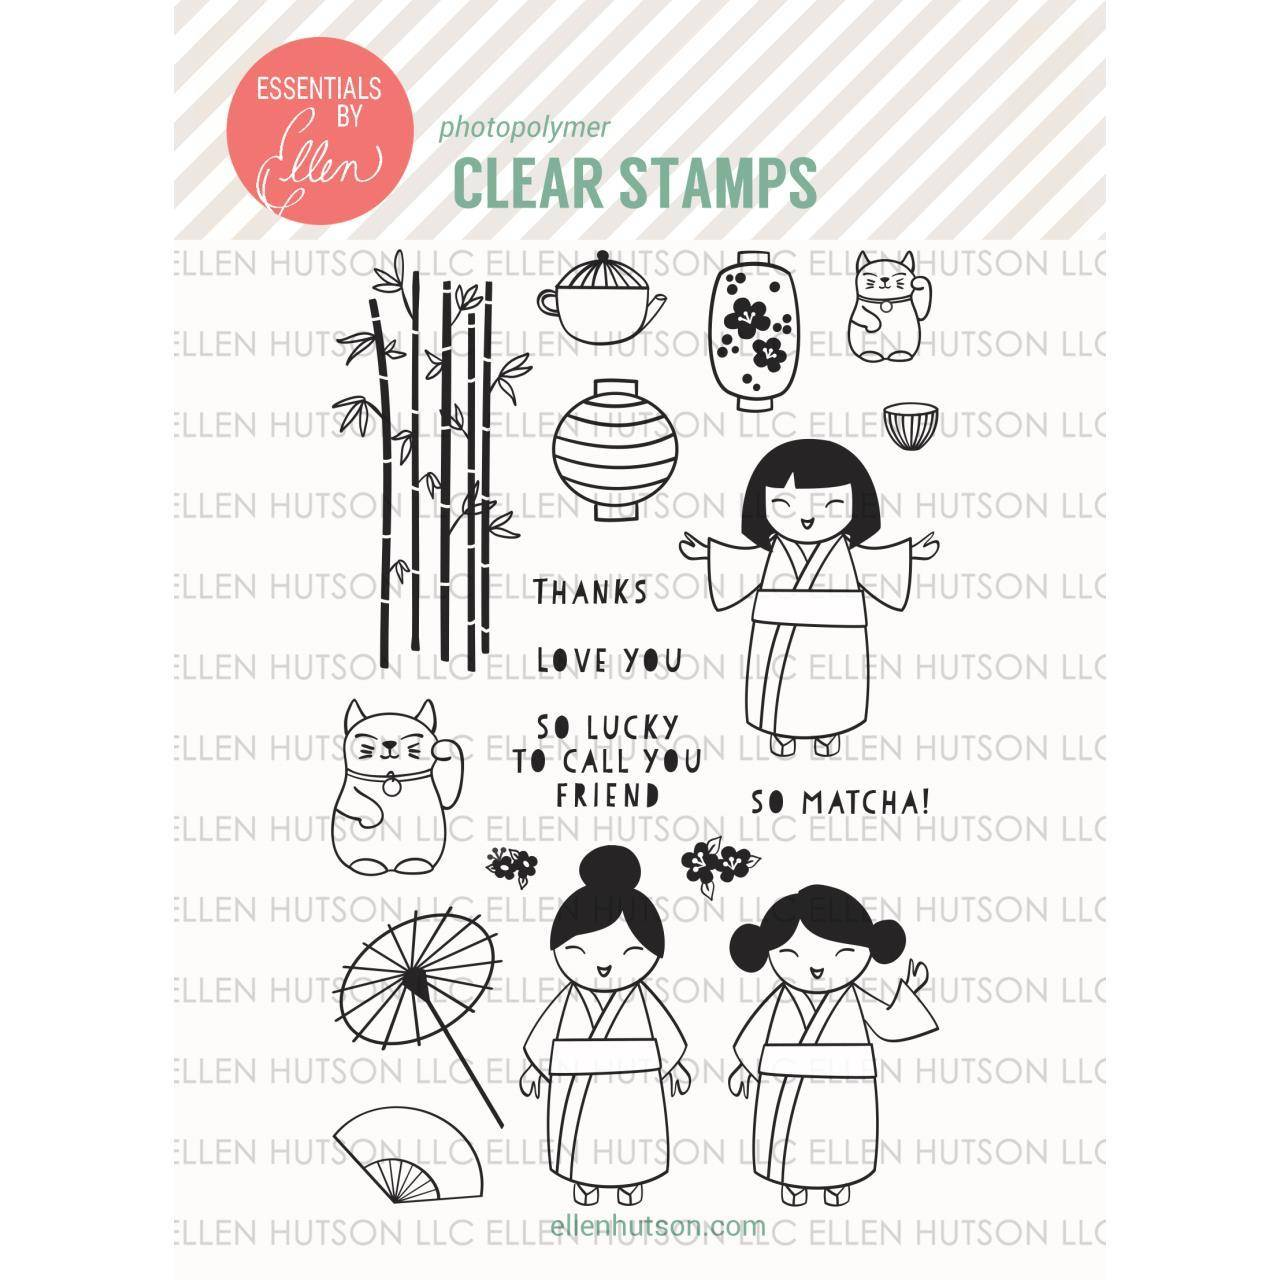 Essentials by Ellen So Matcha